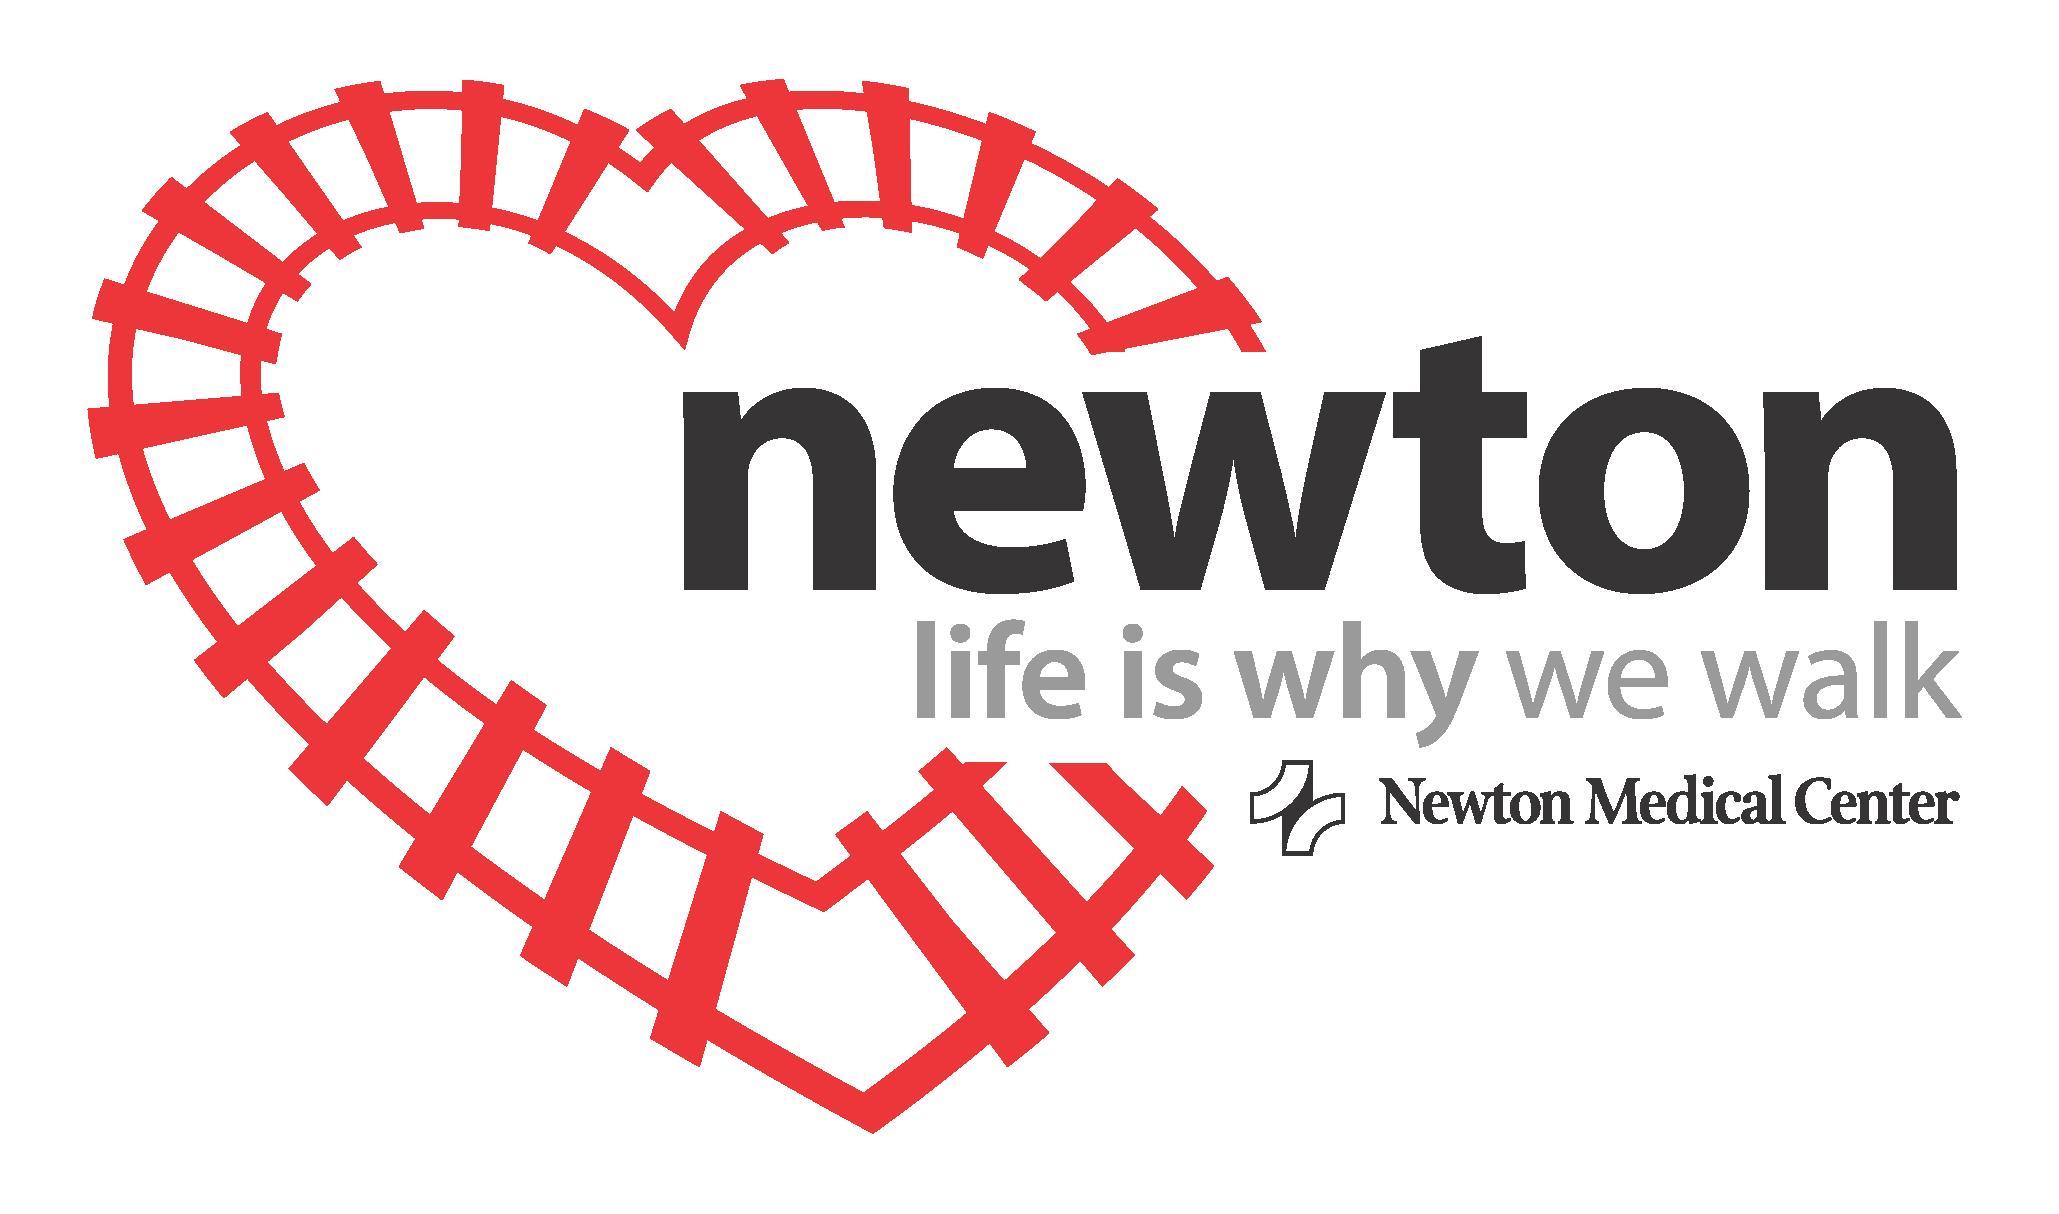 Newton community life is why we walk flyer